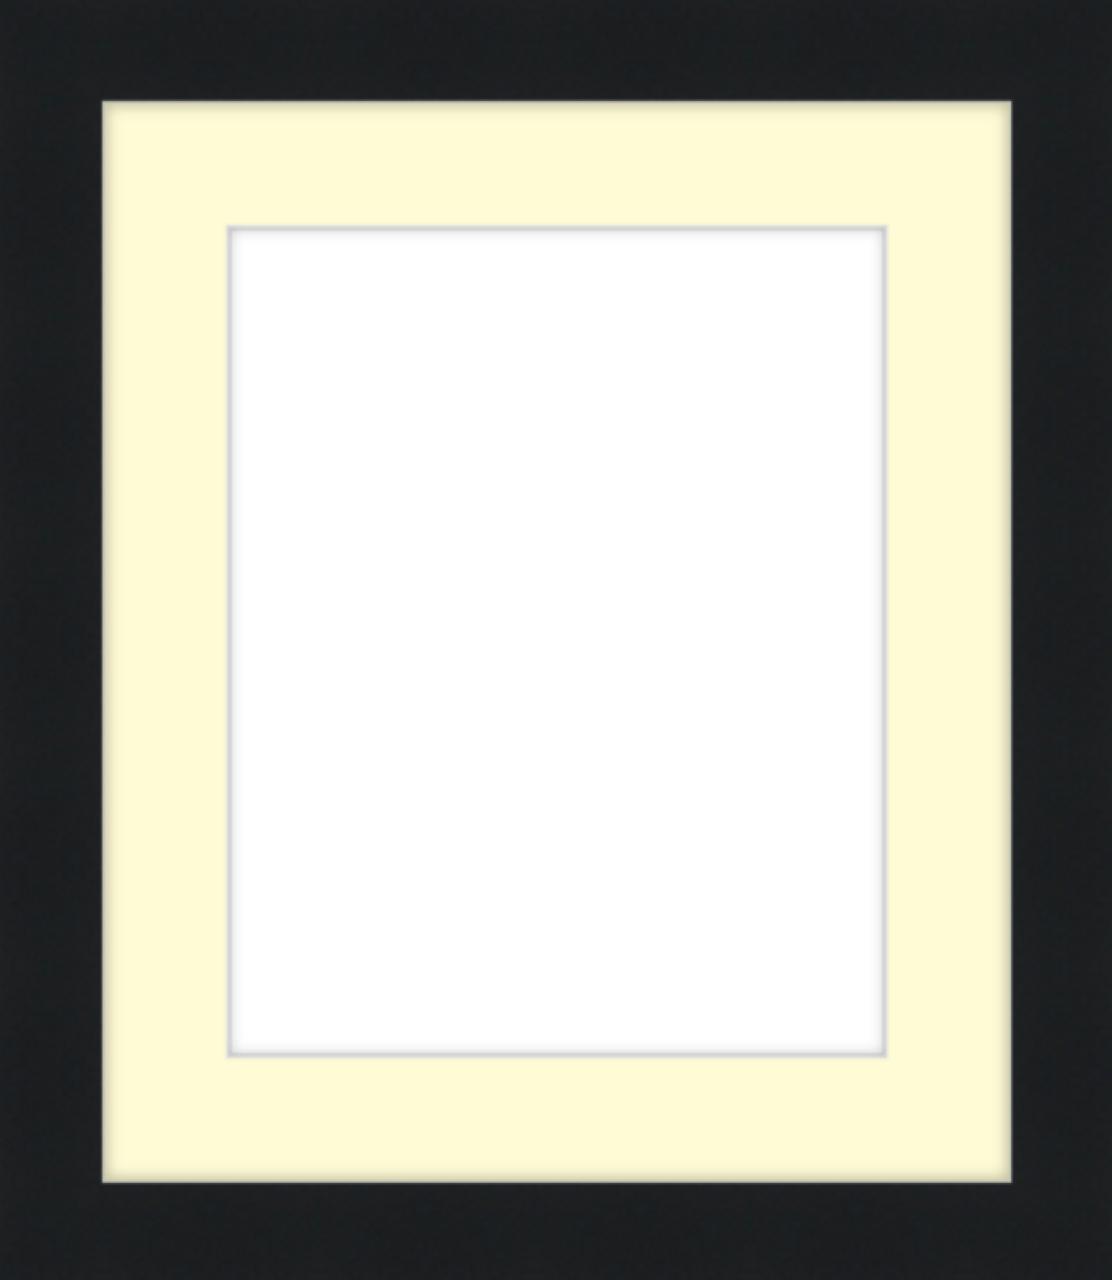 Papyrus matboard